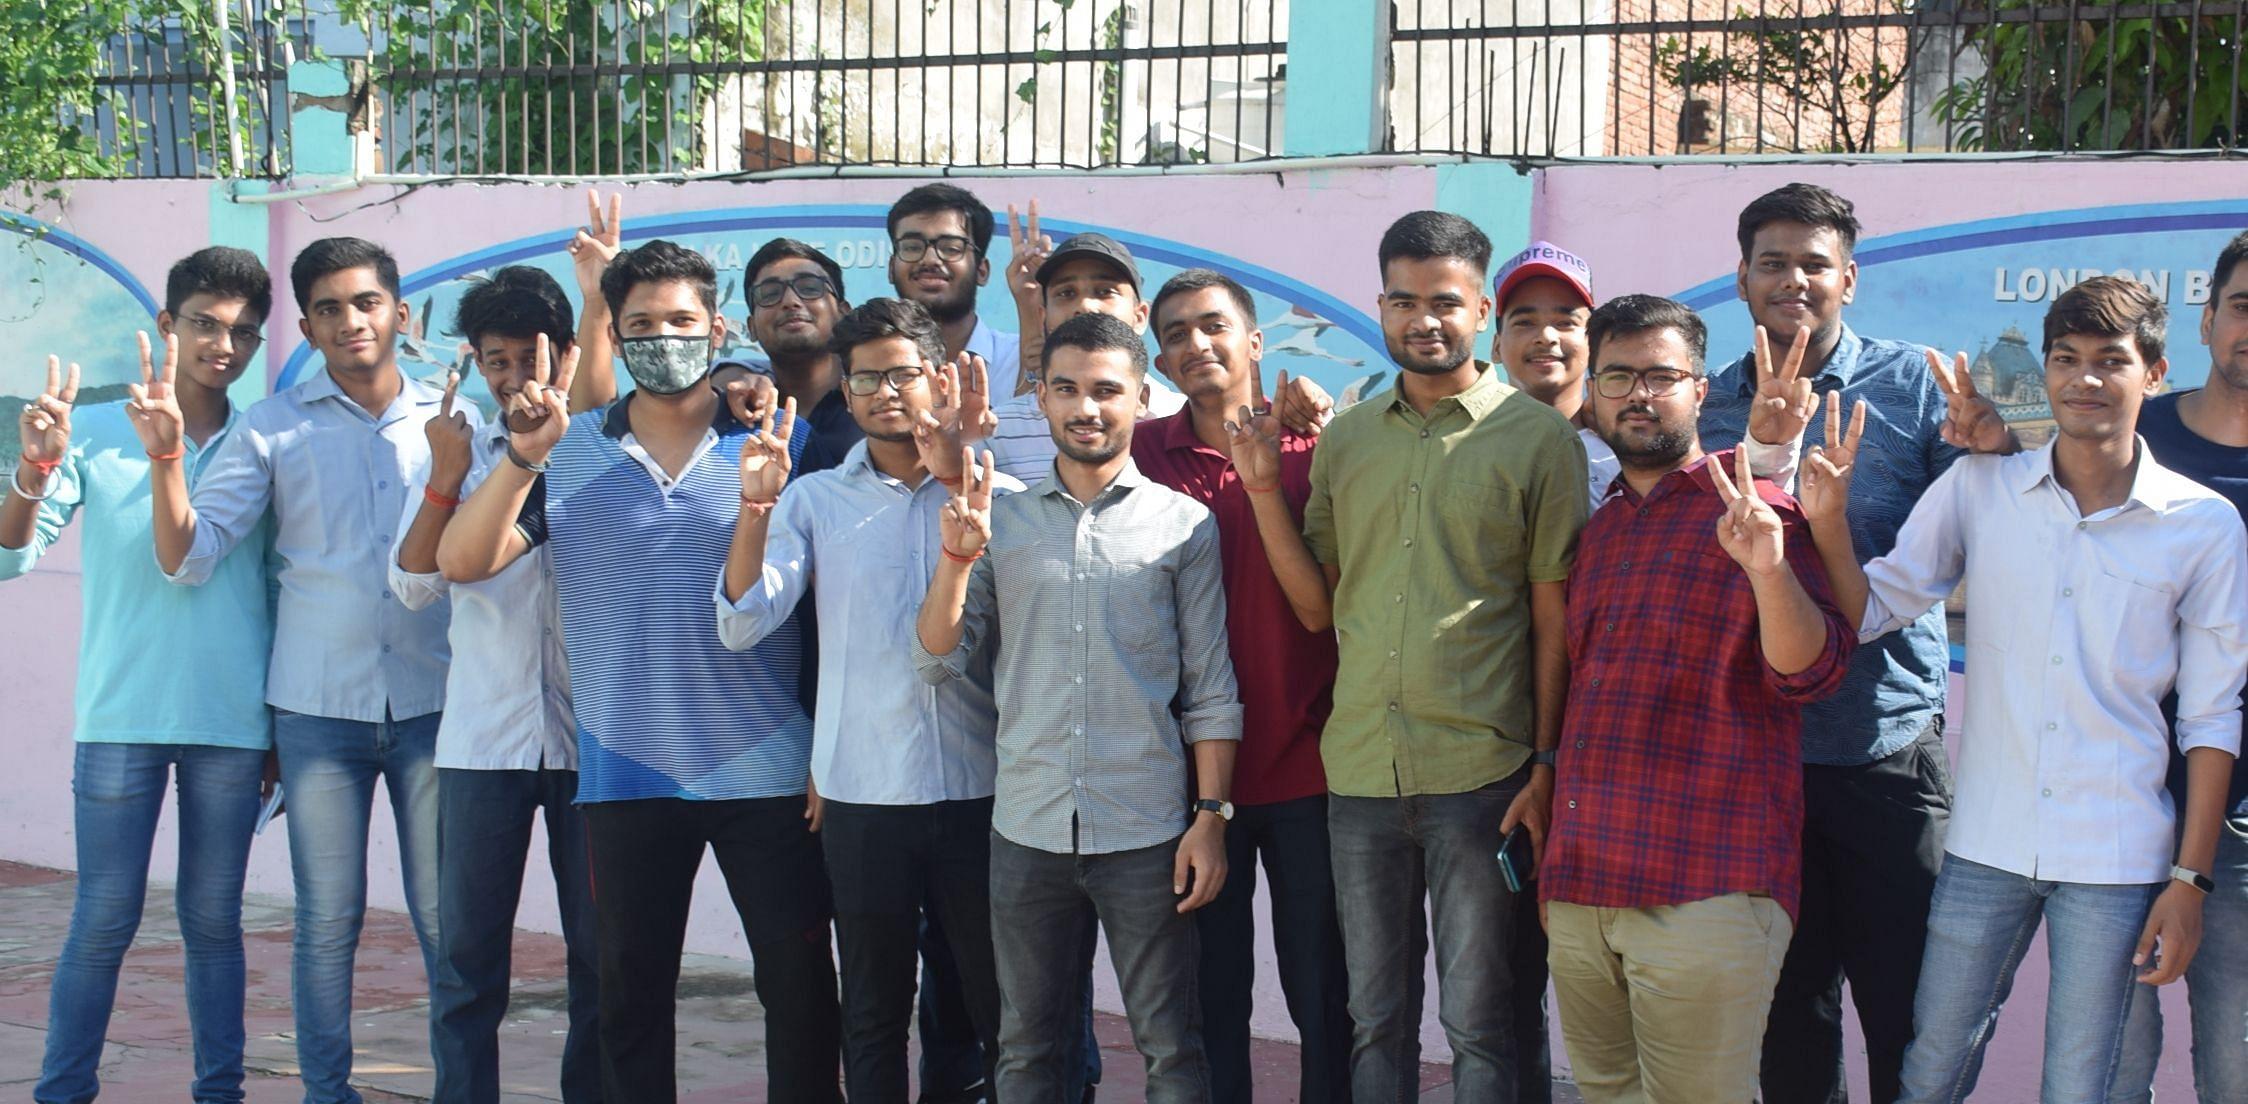 ्रभात एकेडमी में आईसीएसई बोर्ड इंटर का परणिाम देख उत्साहित छात्र। संवाद